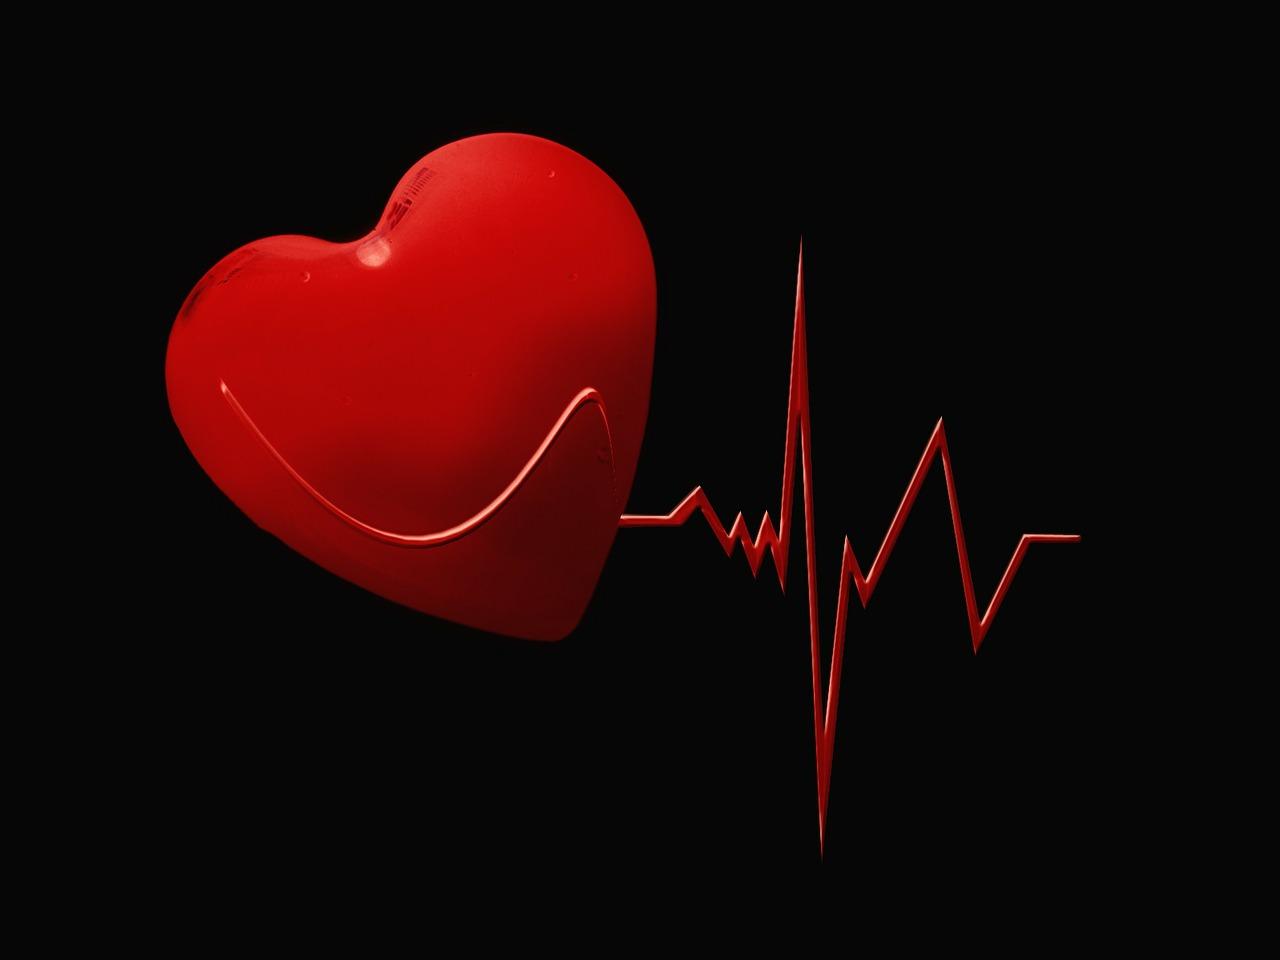 heart, cardio, heart health, health